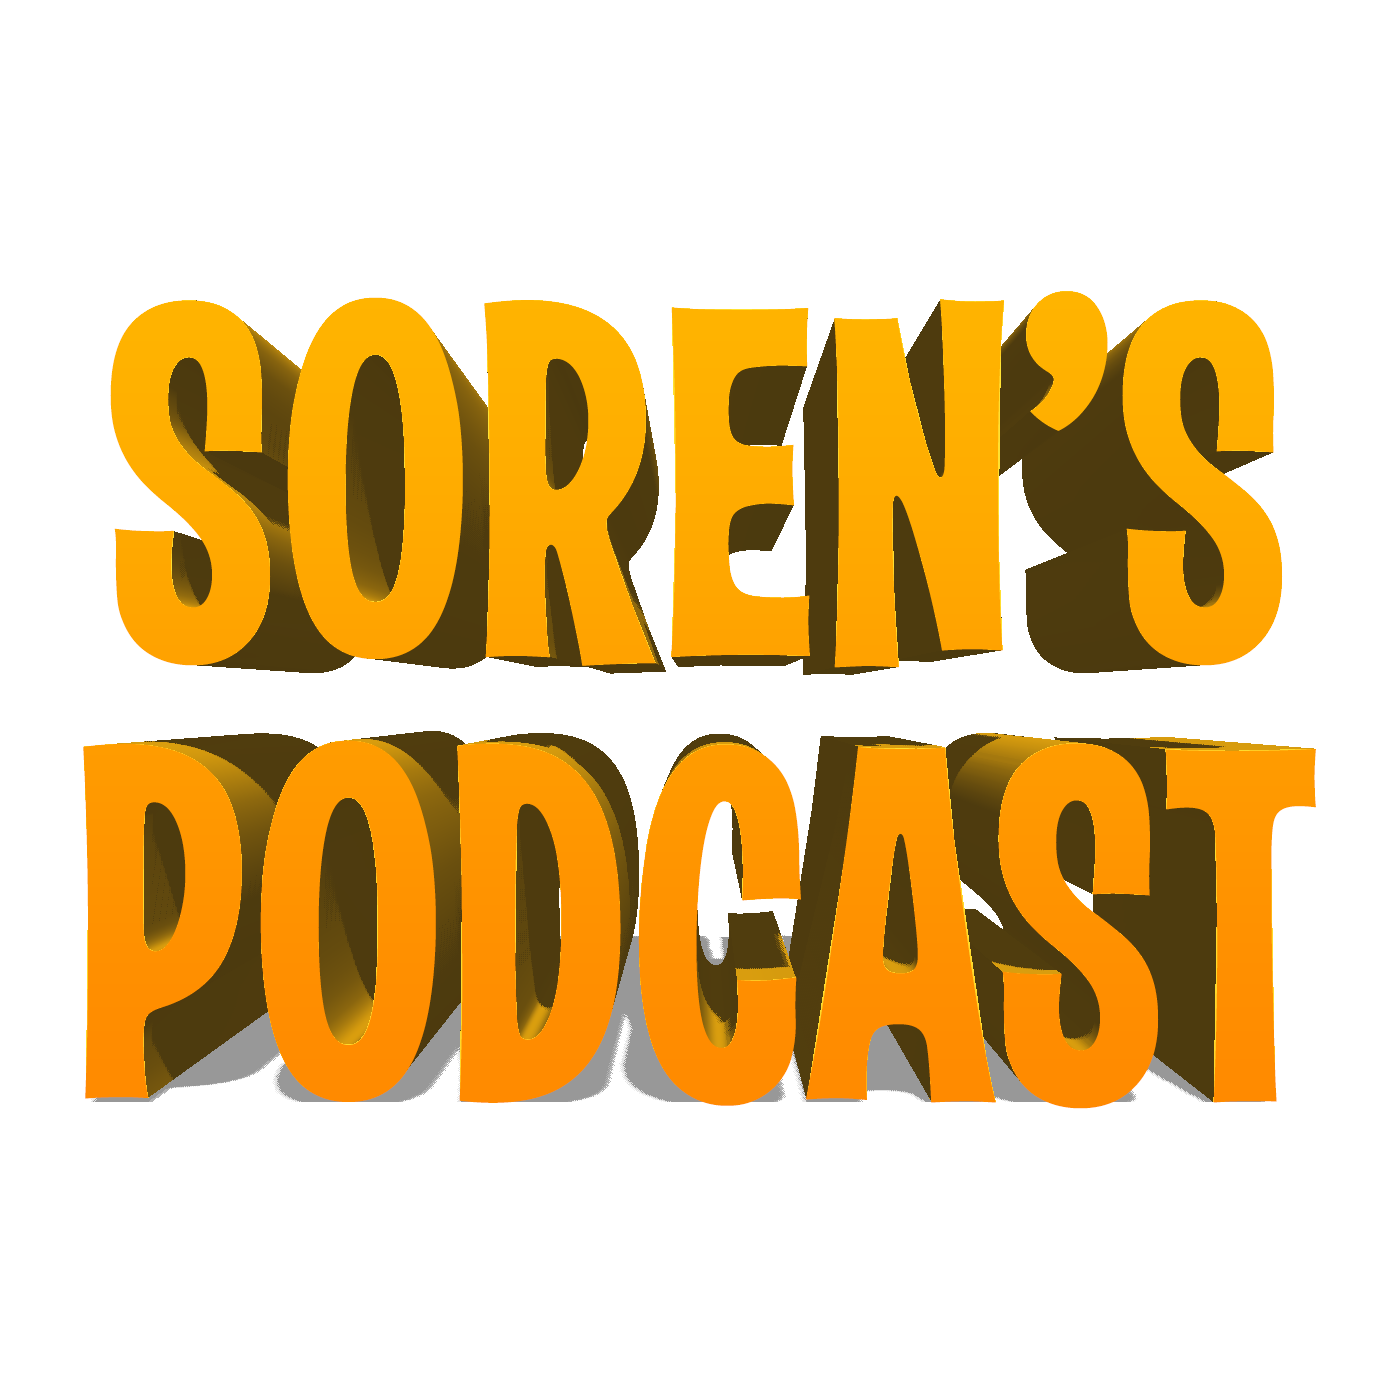 Soren's Podcast